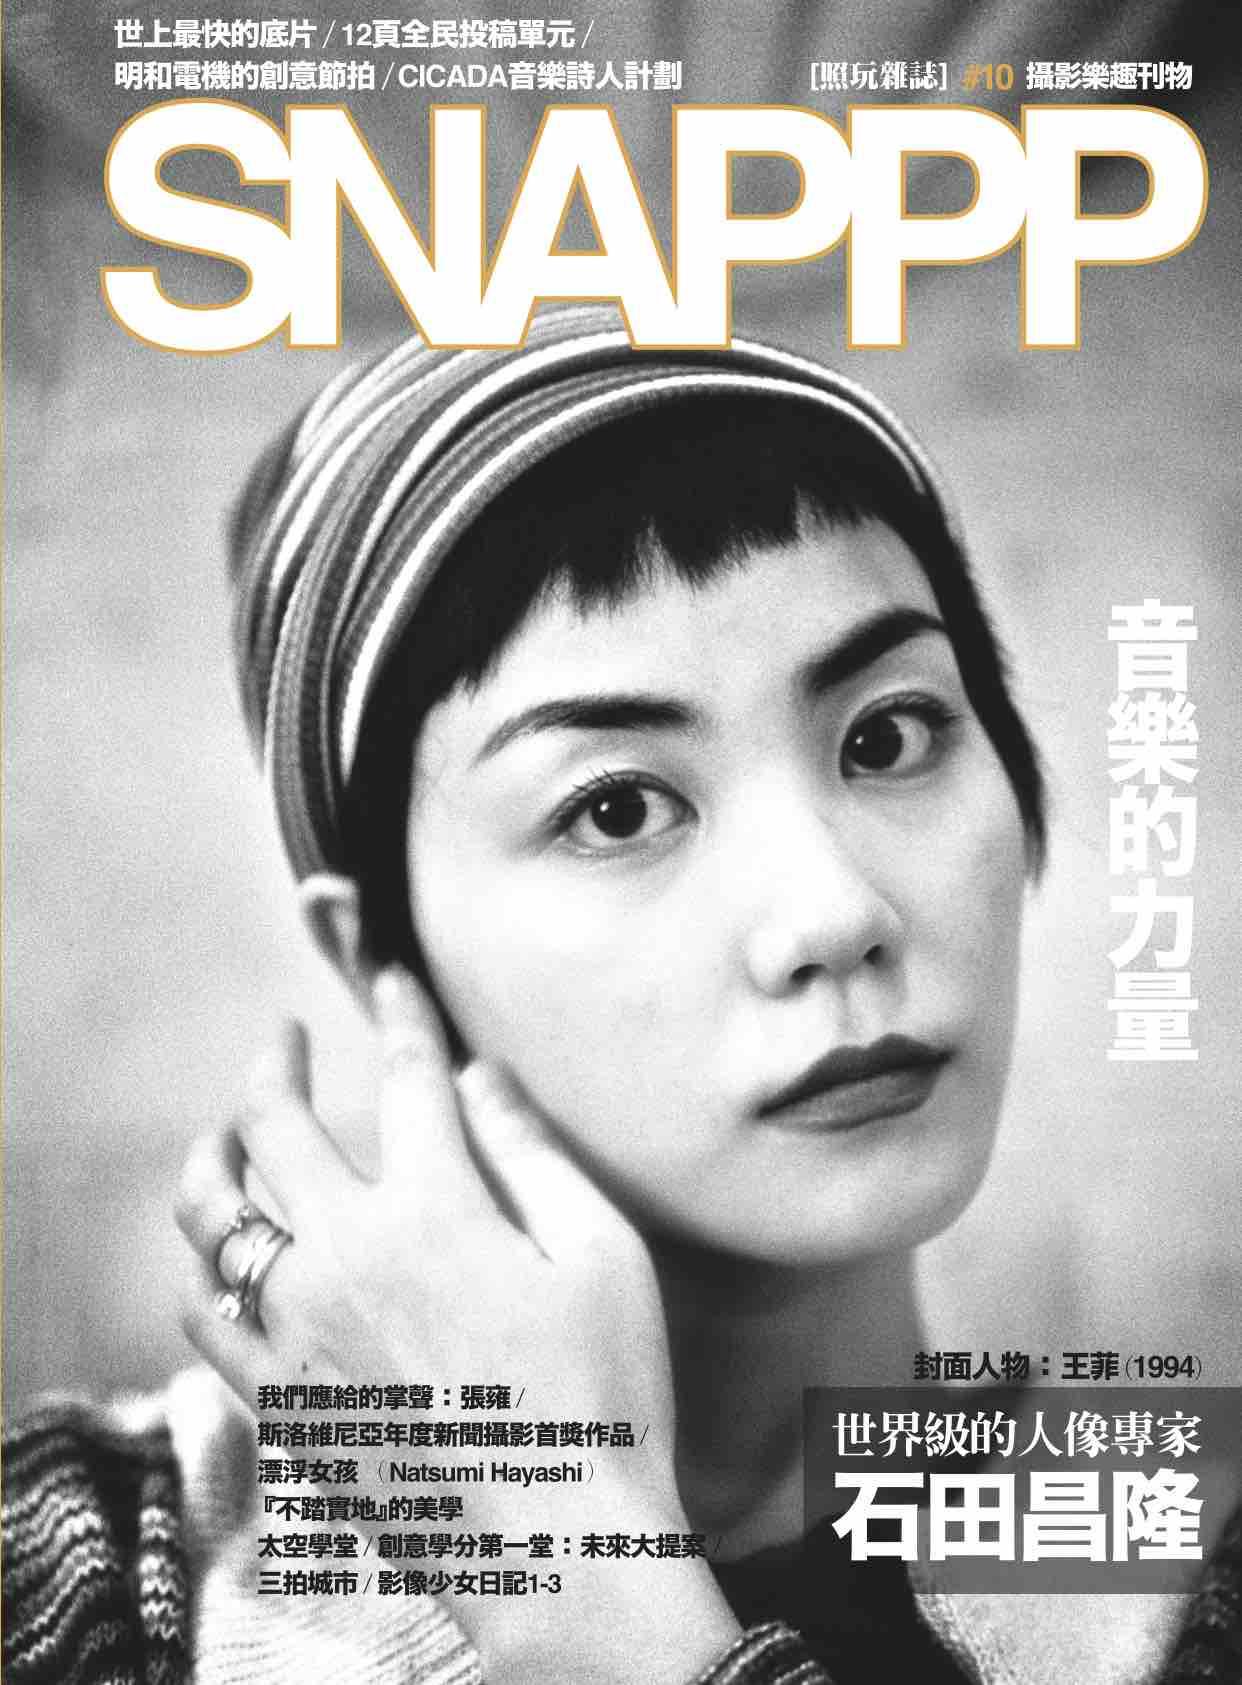 SNAPPP-NO10.jpg